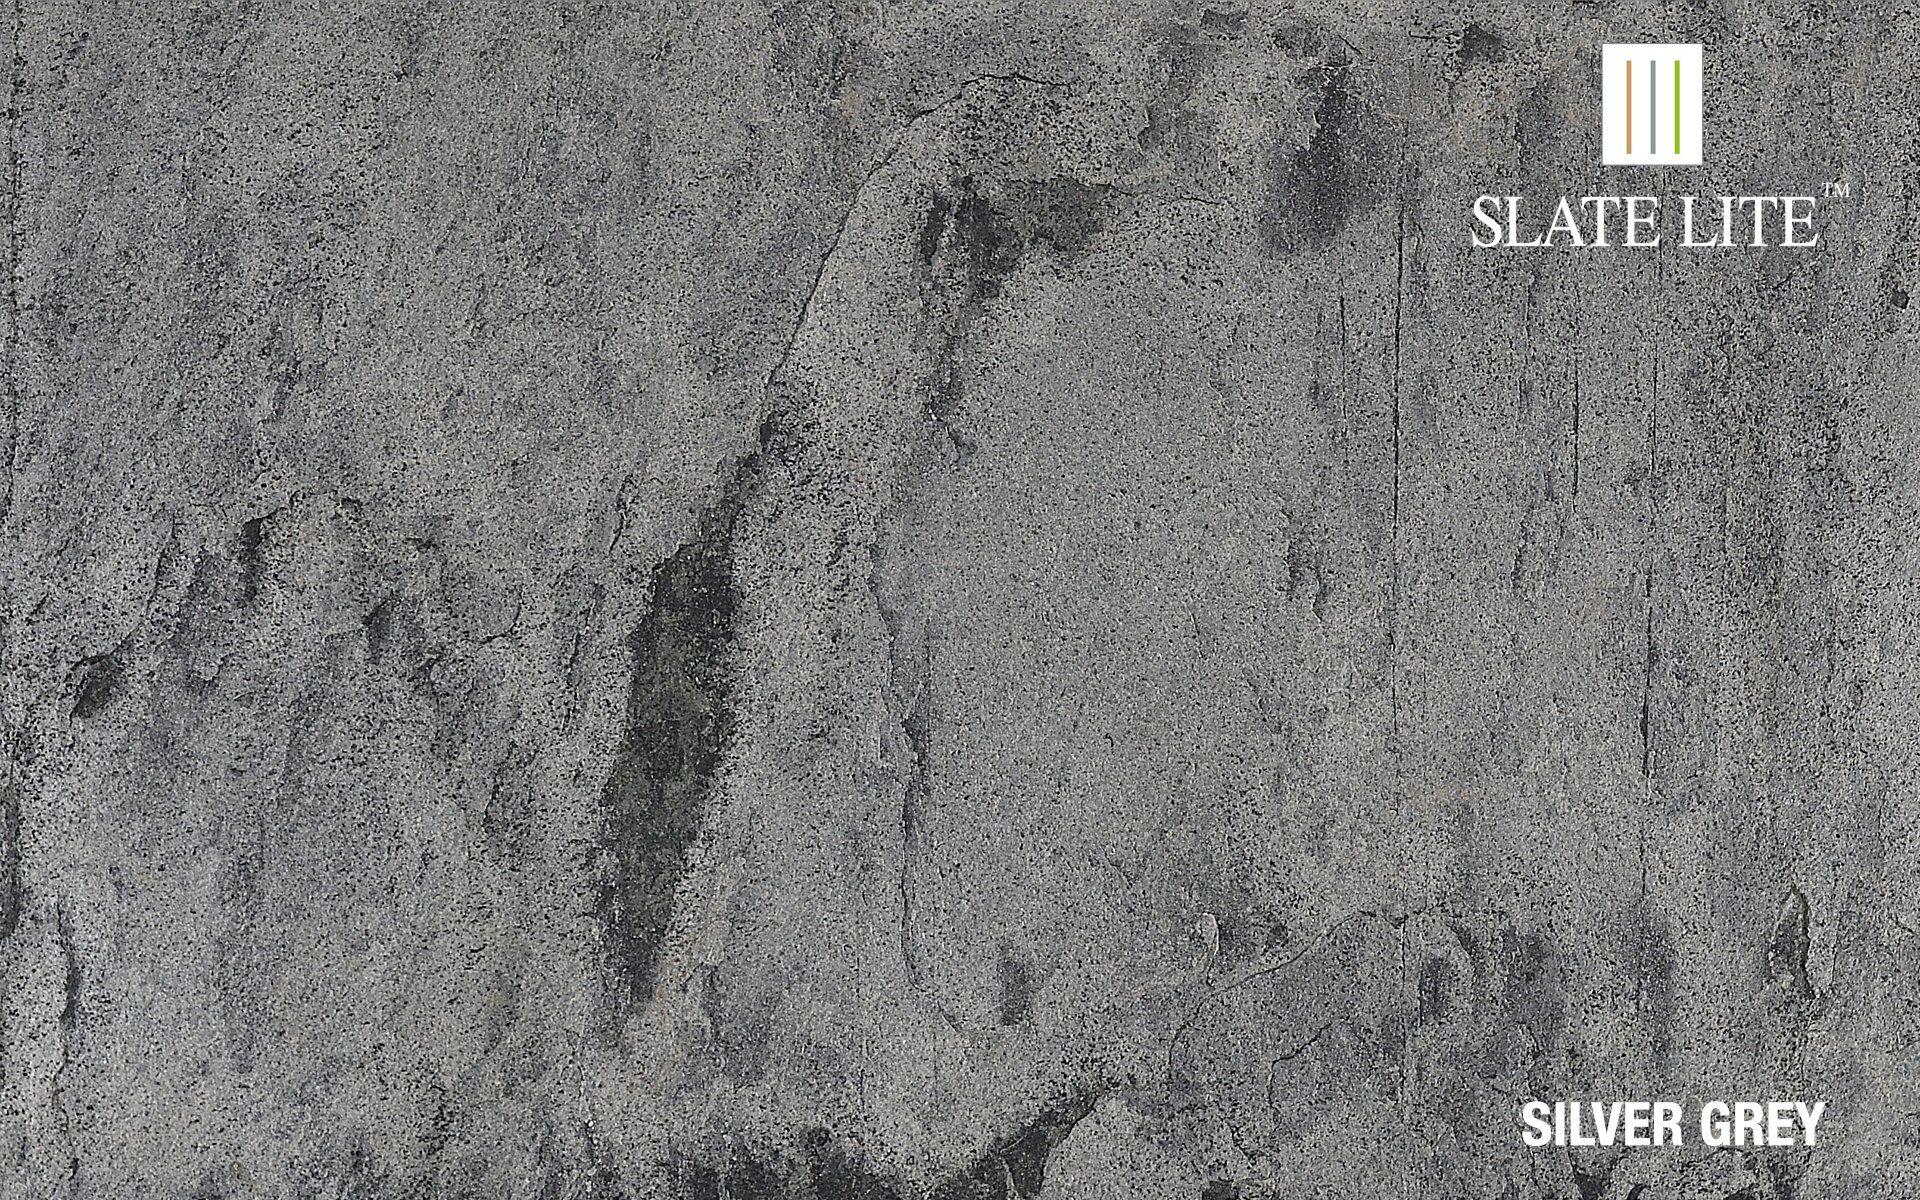 silvergrey01.jpg